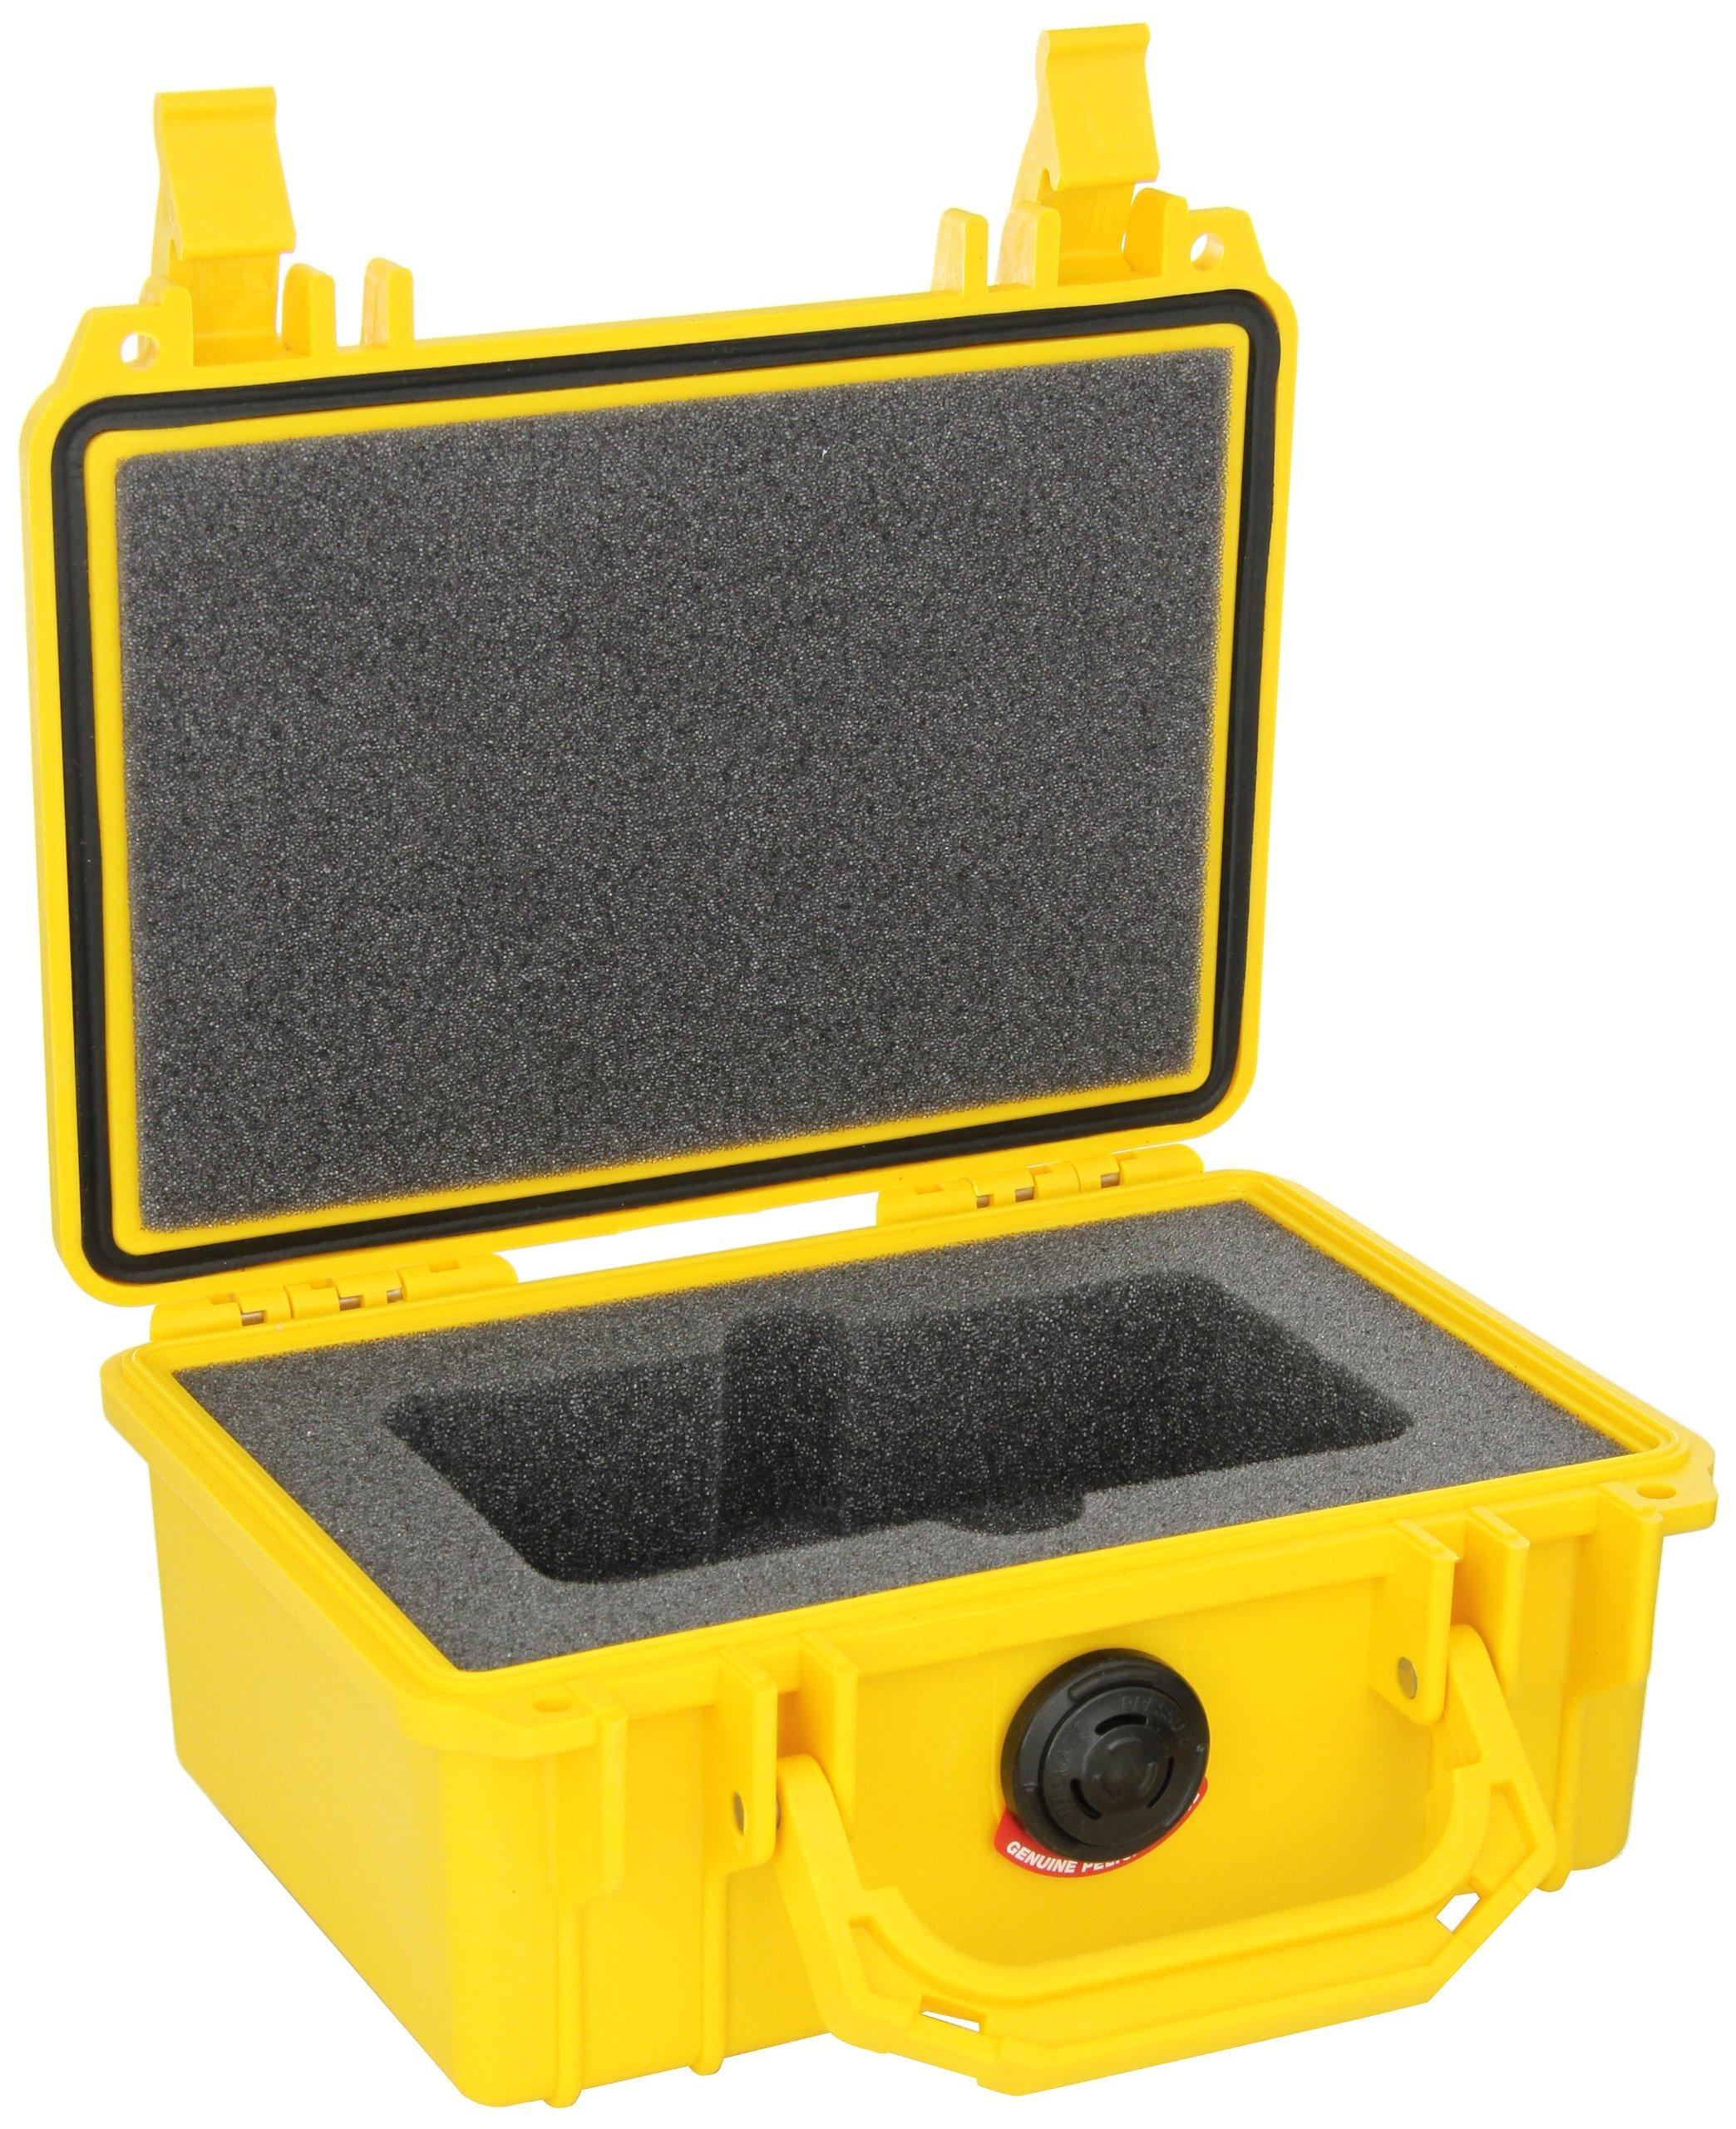 Mazur Instruments PRM-HC-YL Pelican PRM Hard Field Case, 7-1/4'' Length x 4-3/4'' Width, Yellow by Mazur Instruments (Image #1)